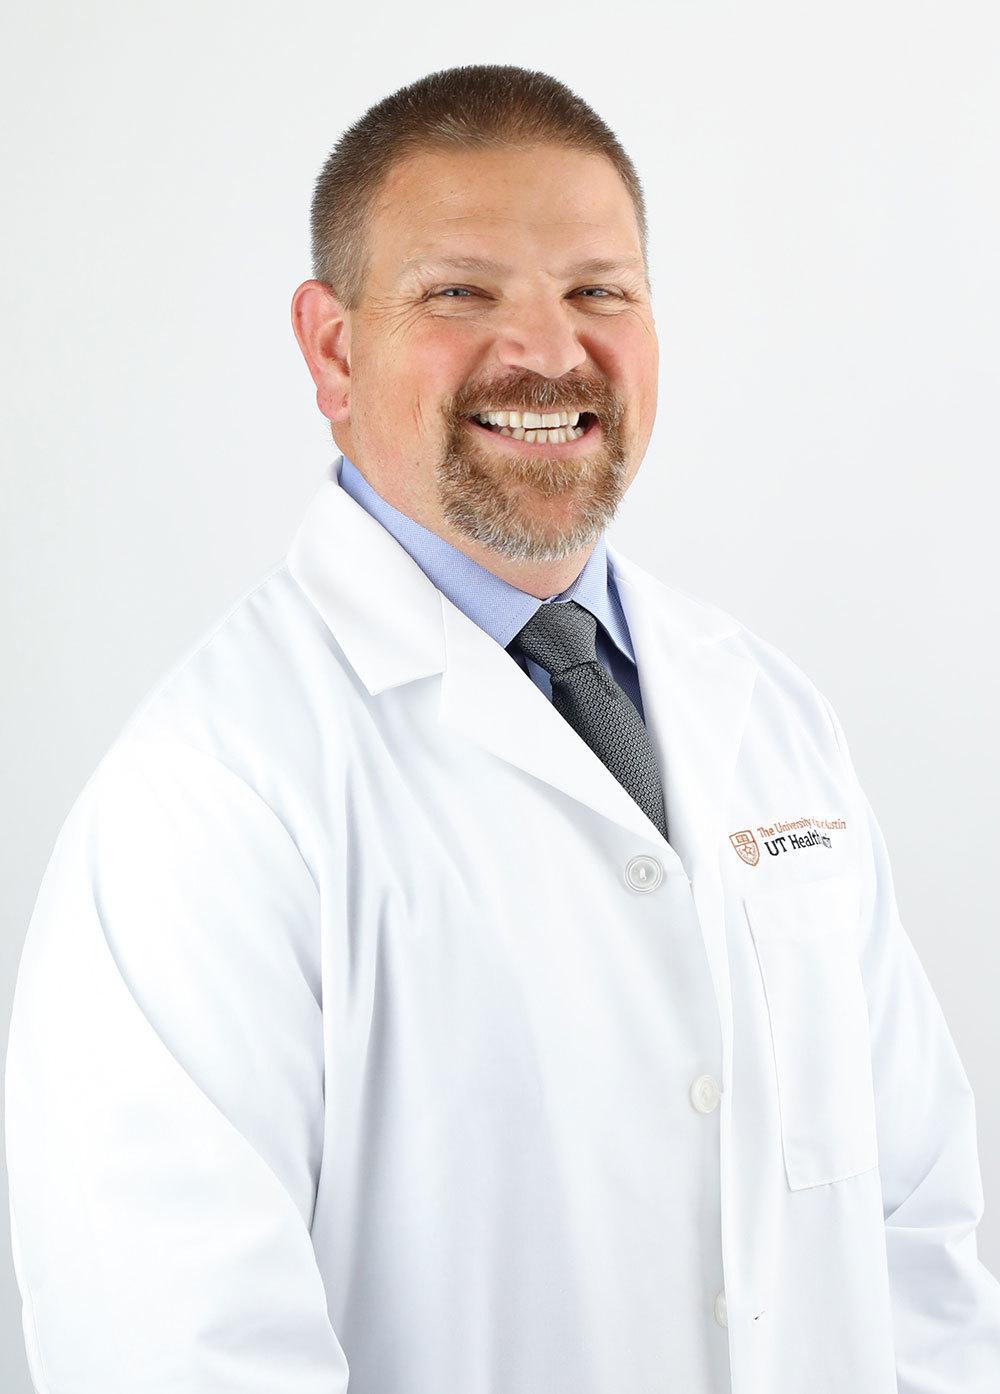 Karl Koenig at UT Health Austin